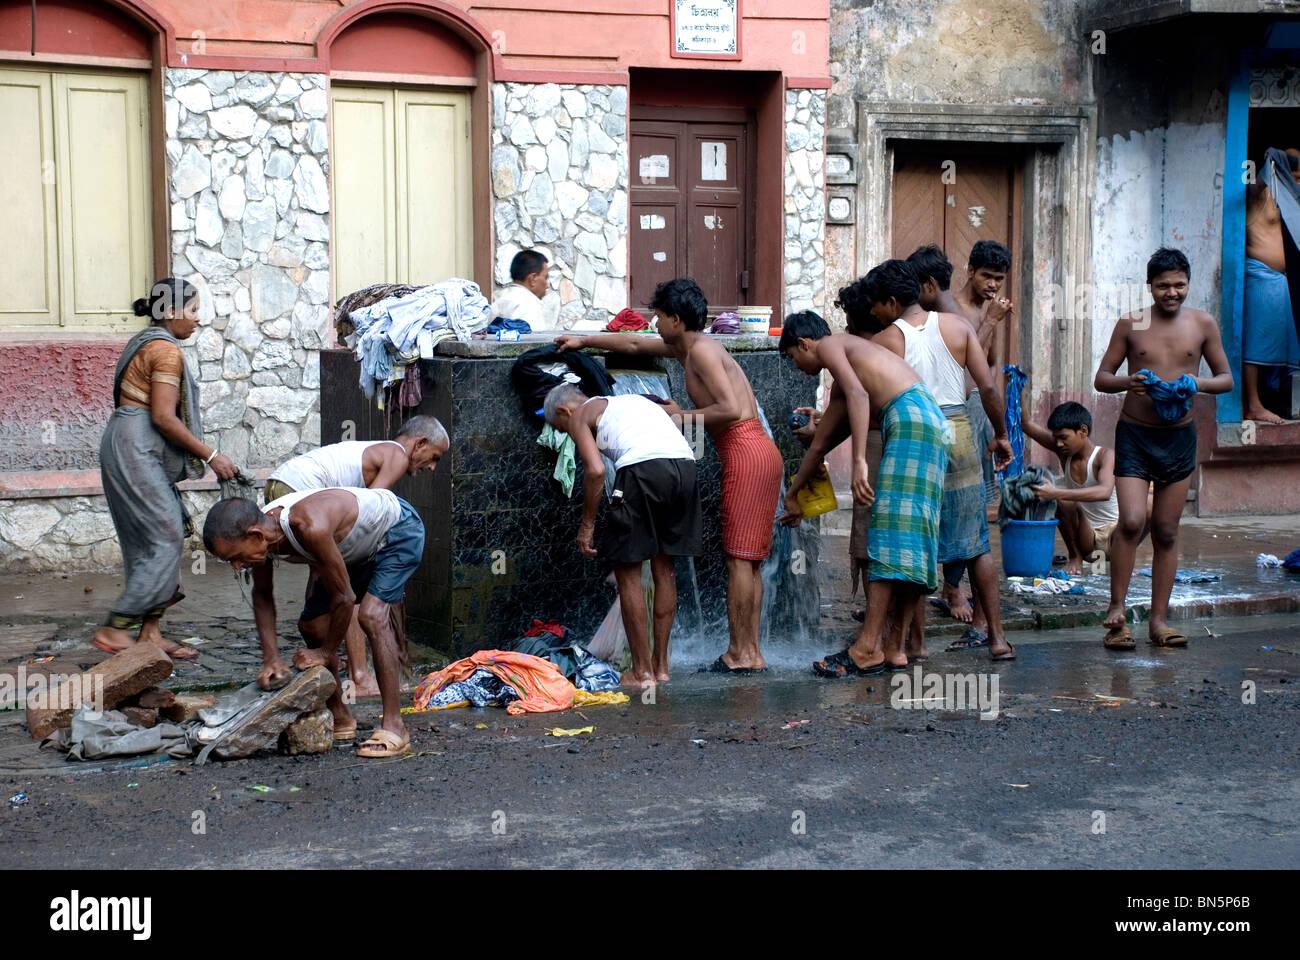 washing on the street calcutta west bengal india - Stock Image